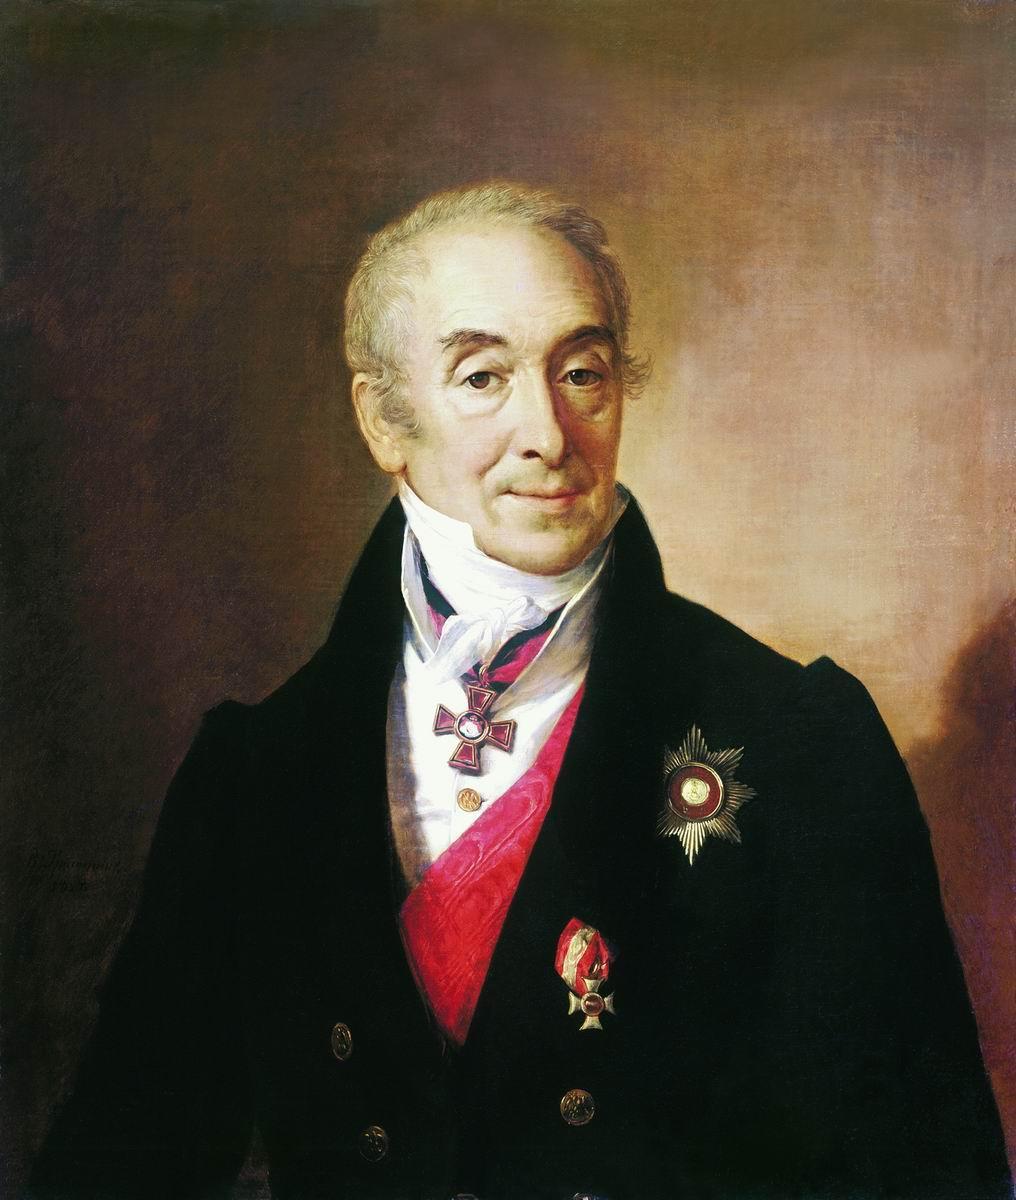 Kushnikov Prokofiev - Vasily Tropinin